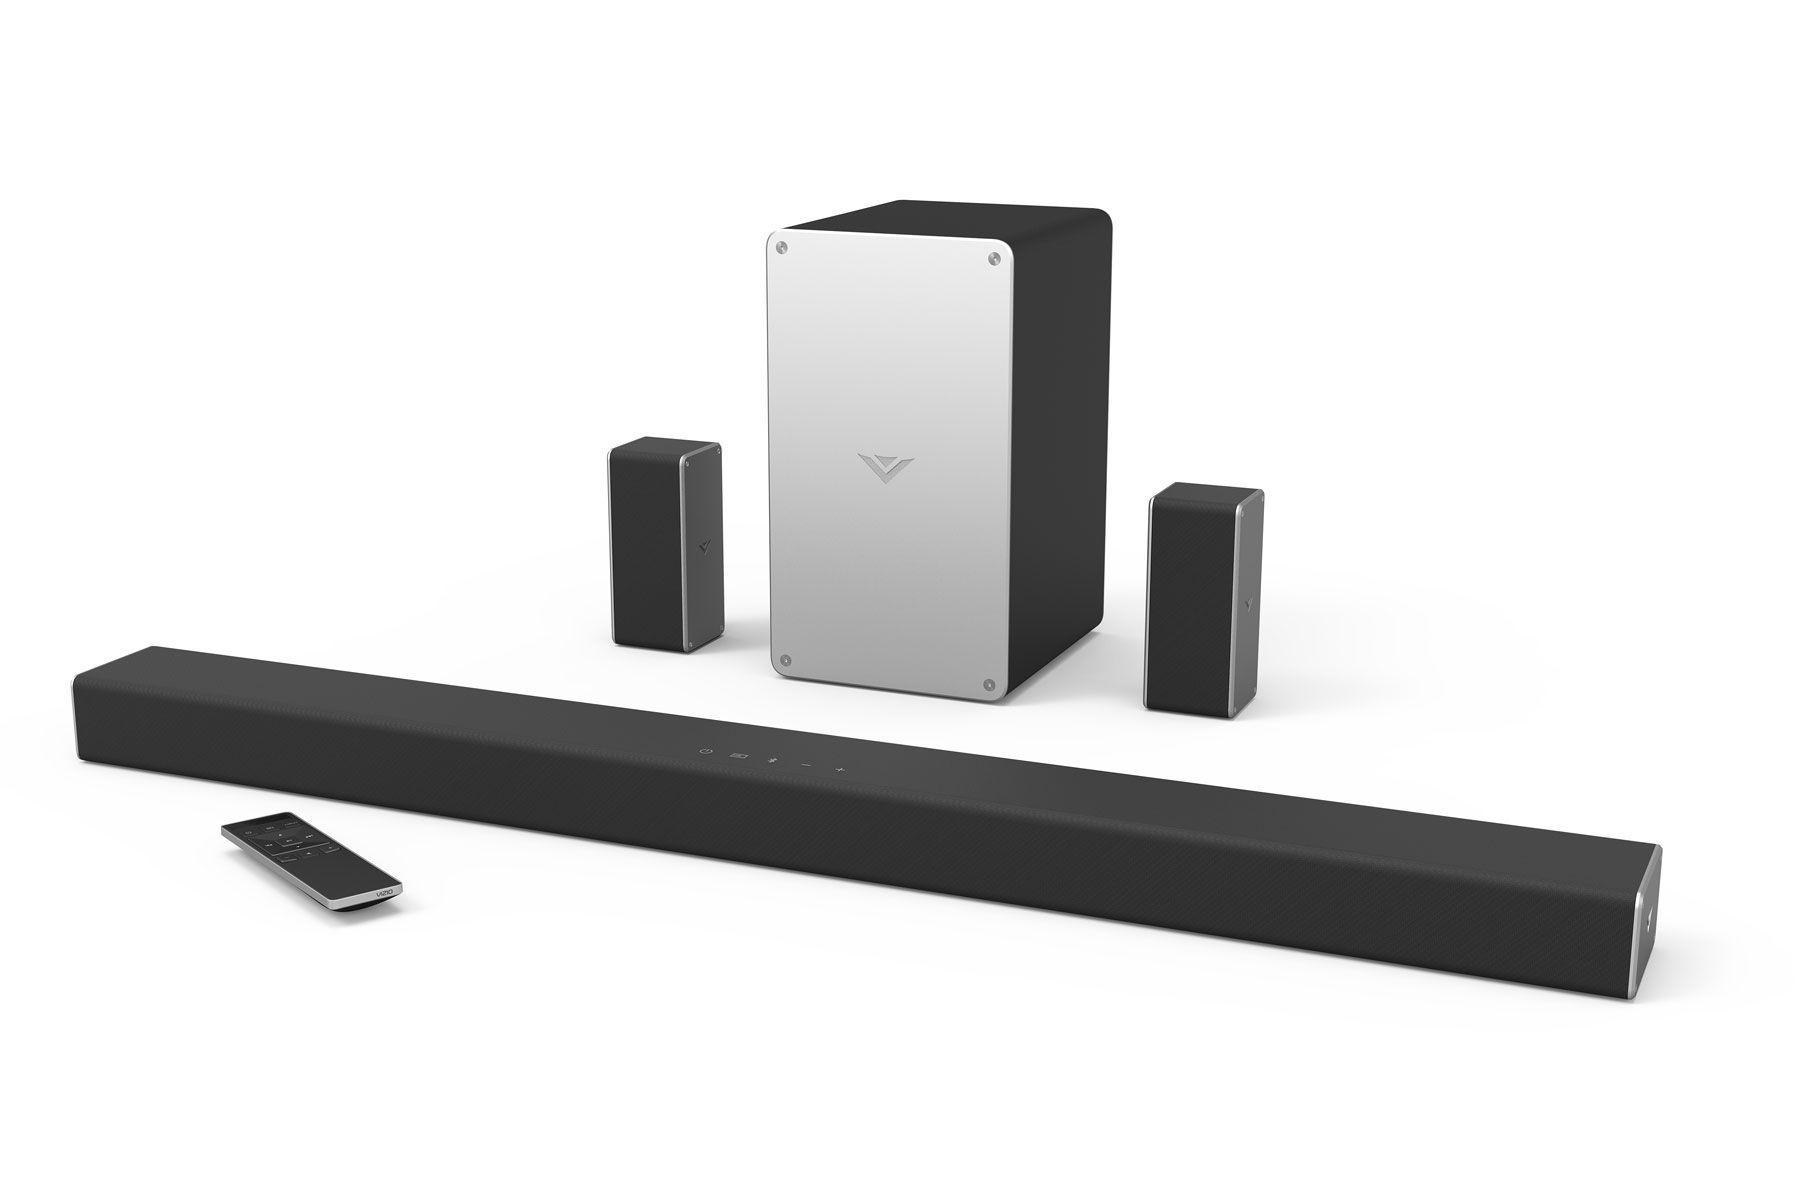 Vizio's 250 soundbar hosts Google Assistant and